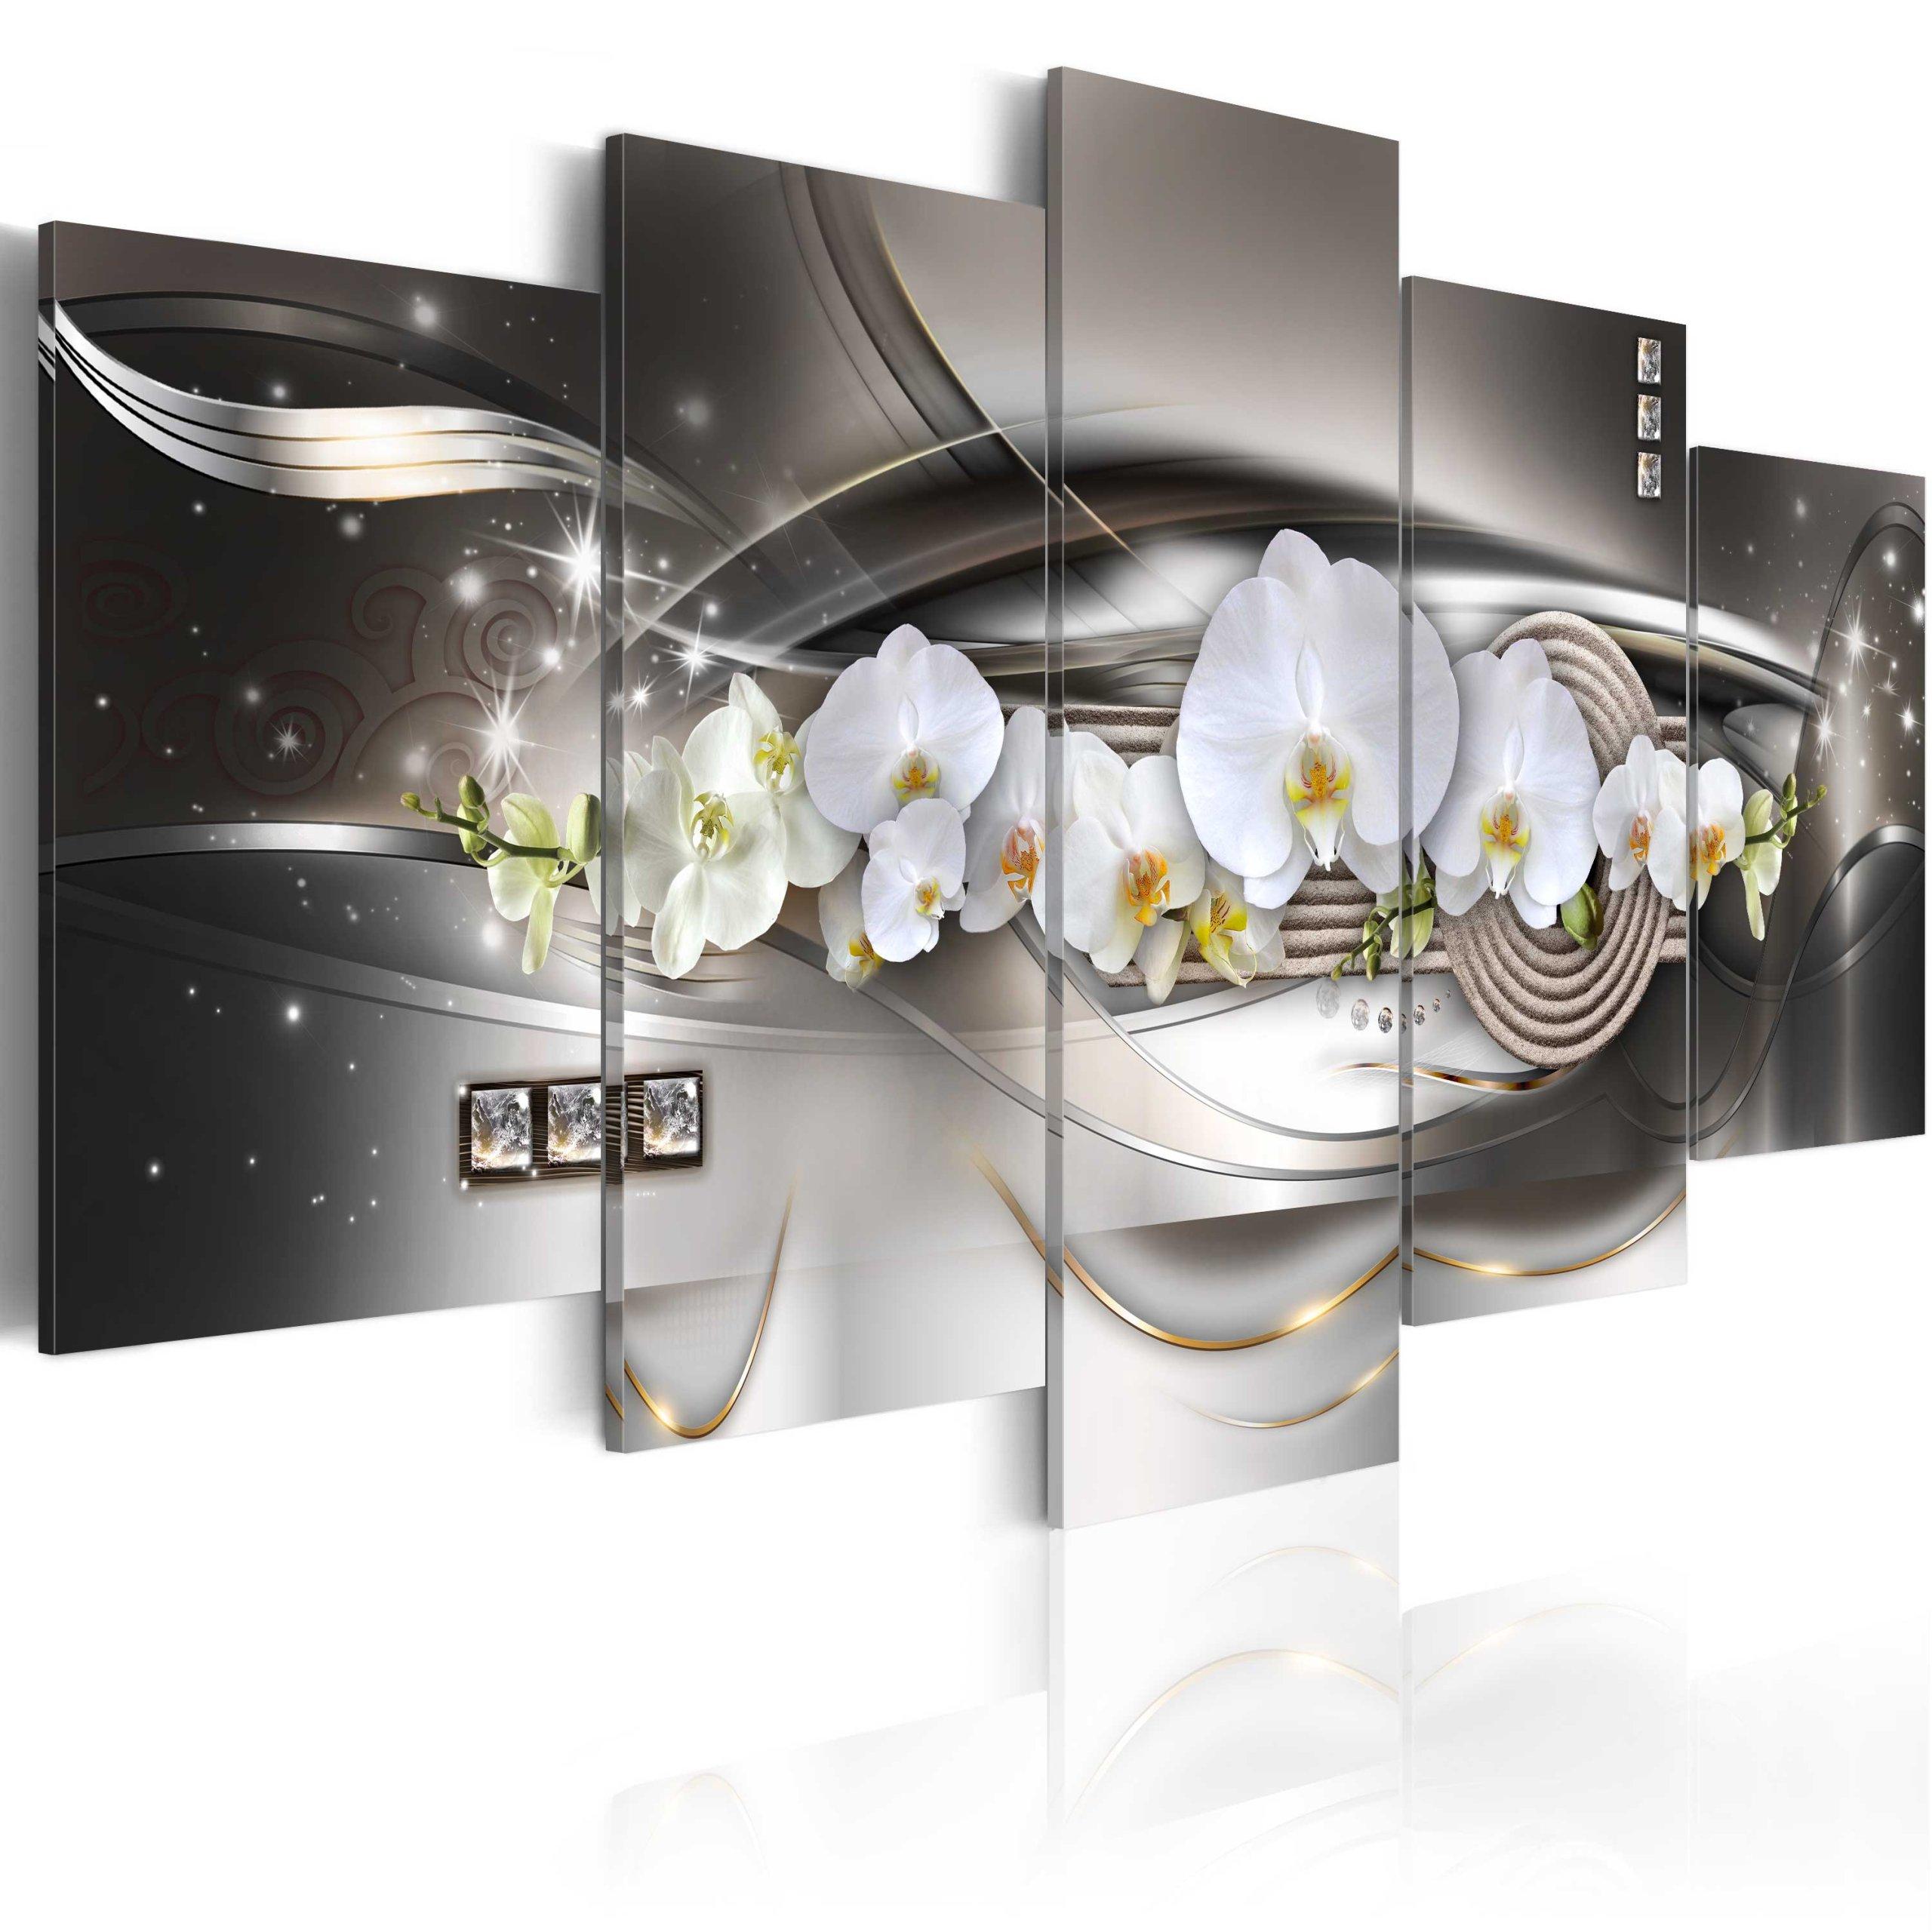 Obrázok 5 dielov 200x100 cm orchidea A-A-0056-B-N